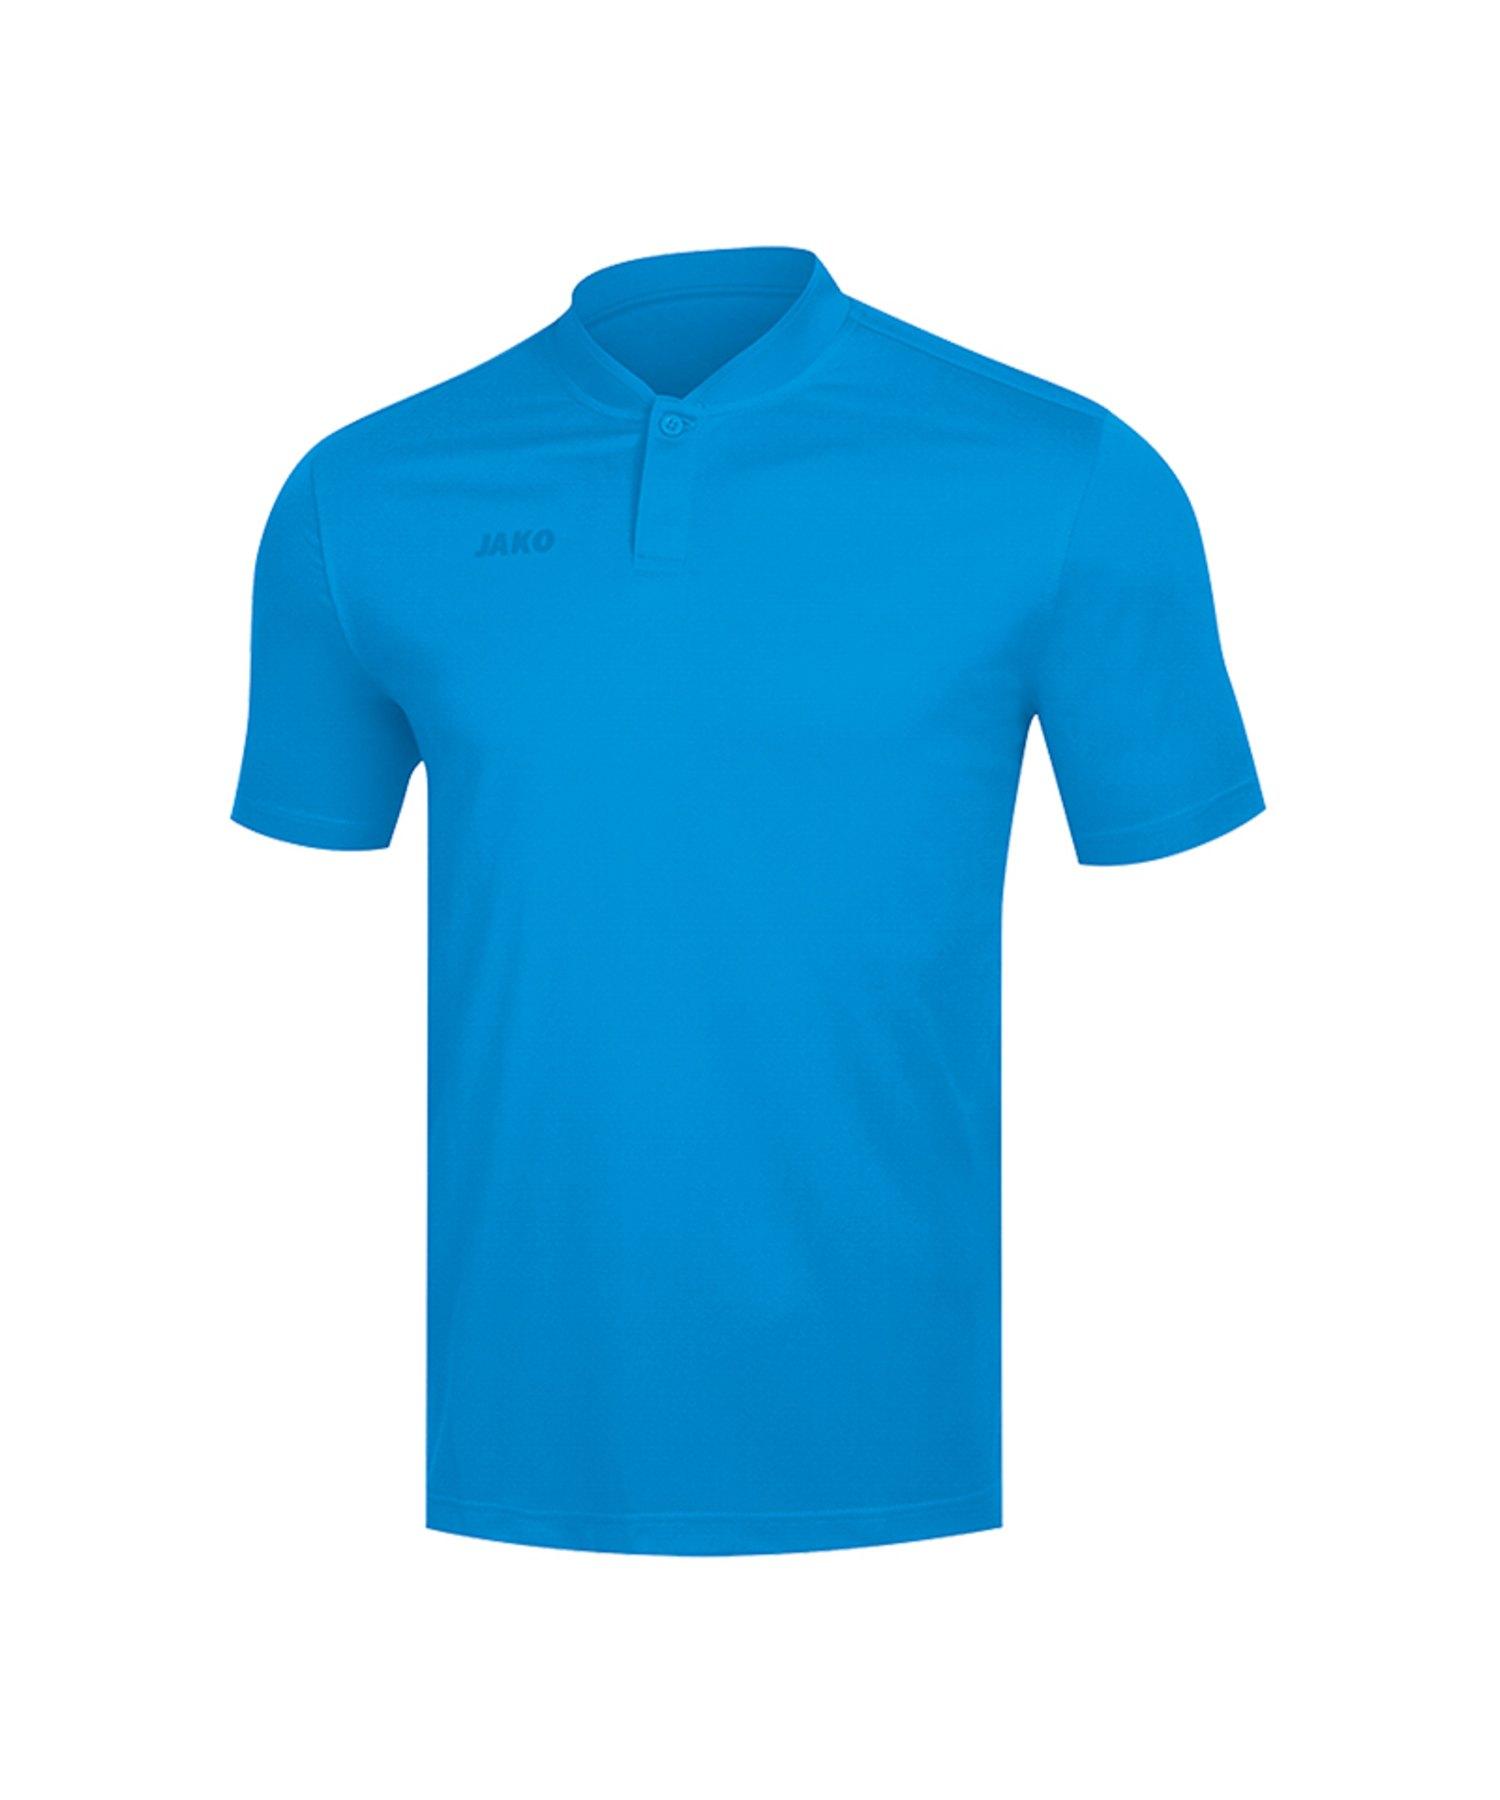 Jako Prestige Poloshirt Blau F89 - Blau